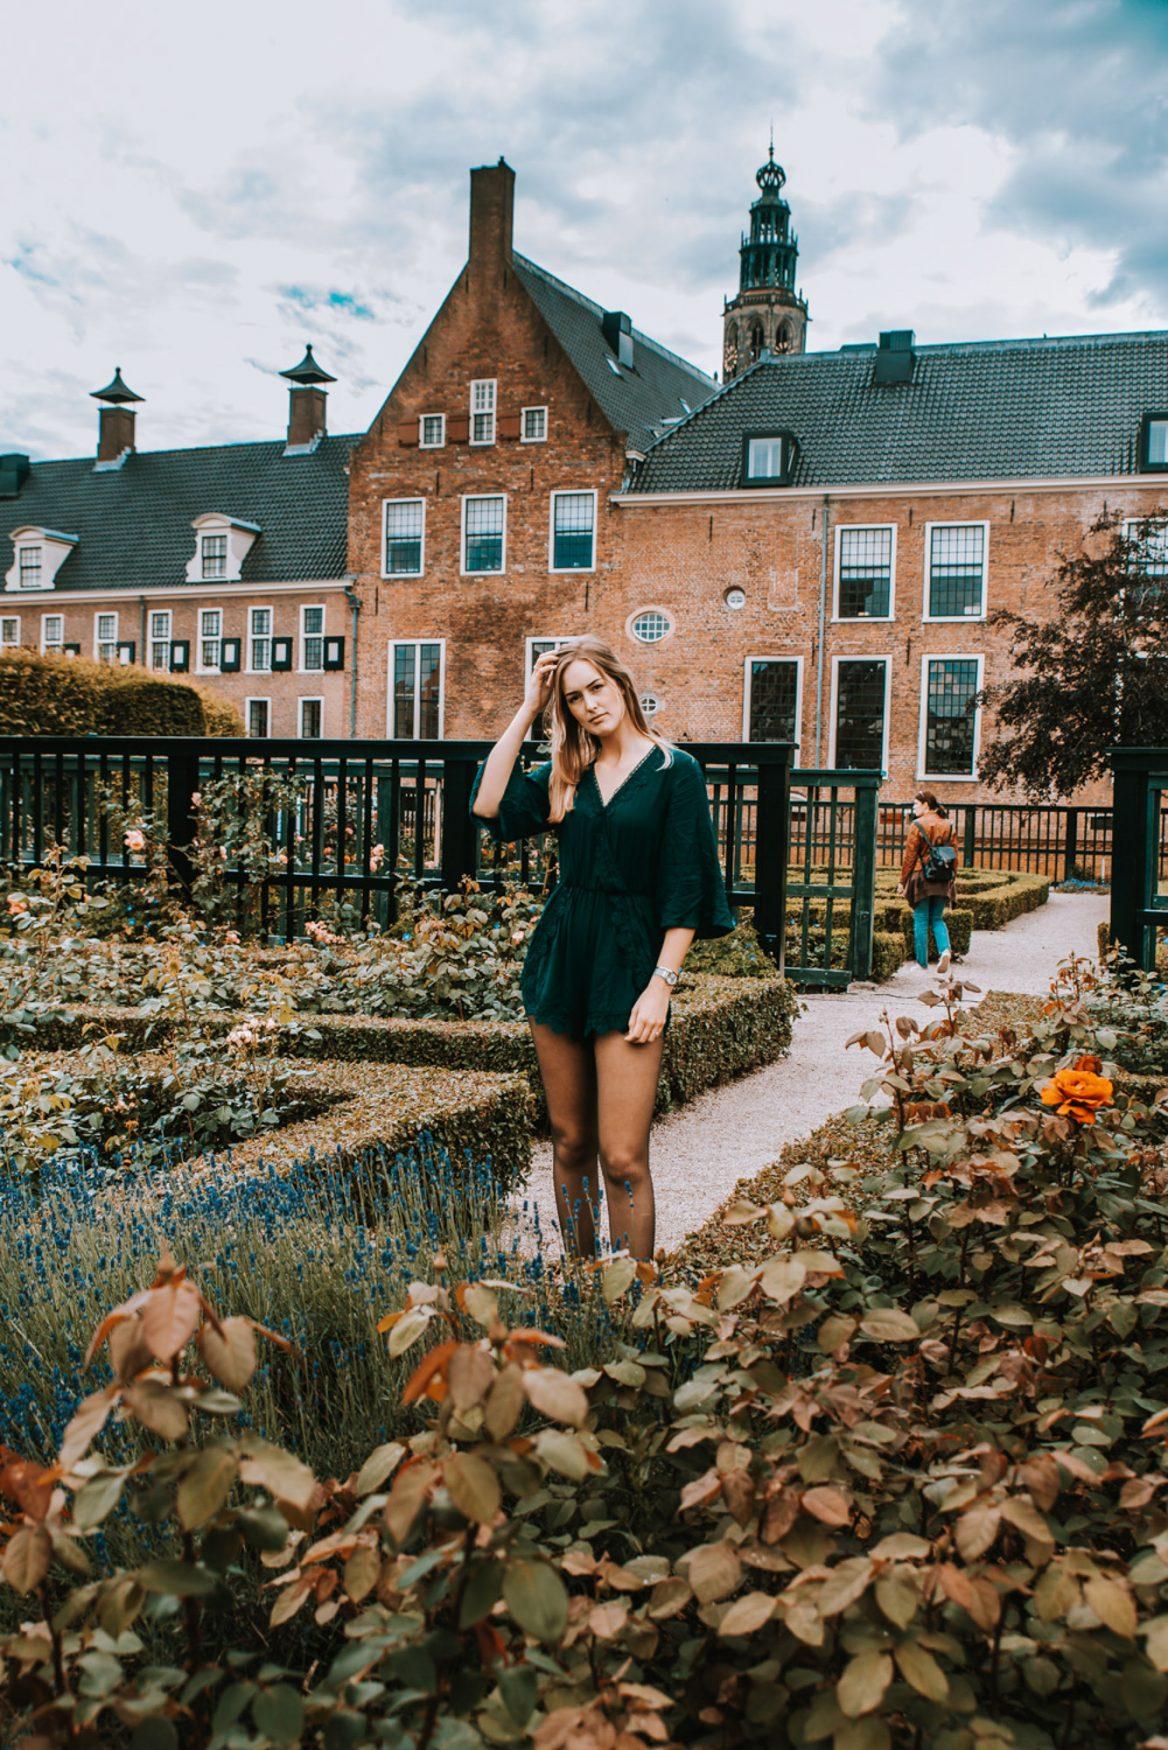 Instagram citytour - Prinsentuin Groningen